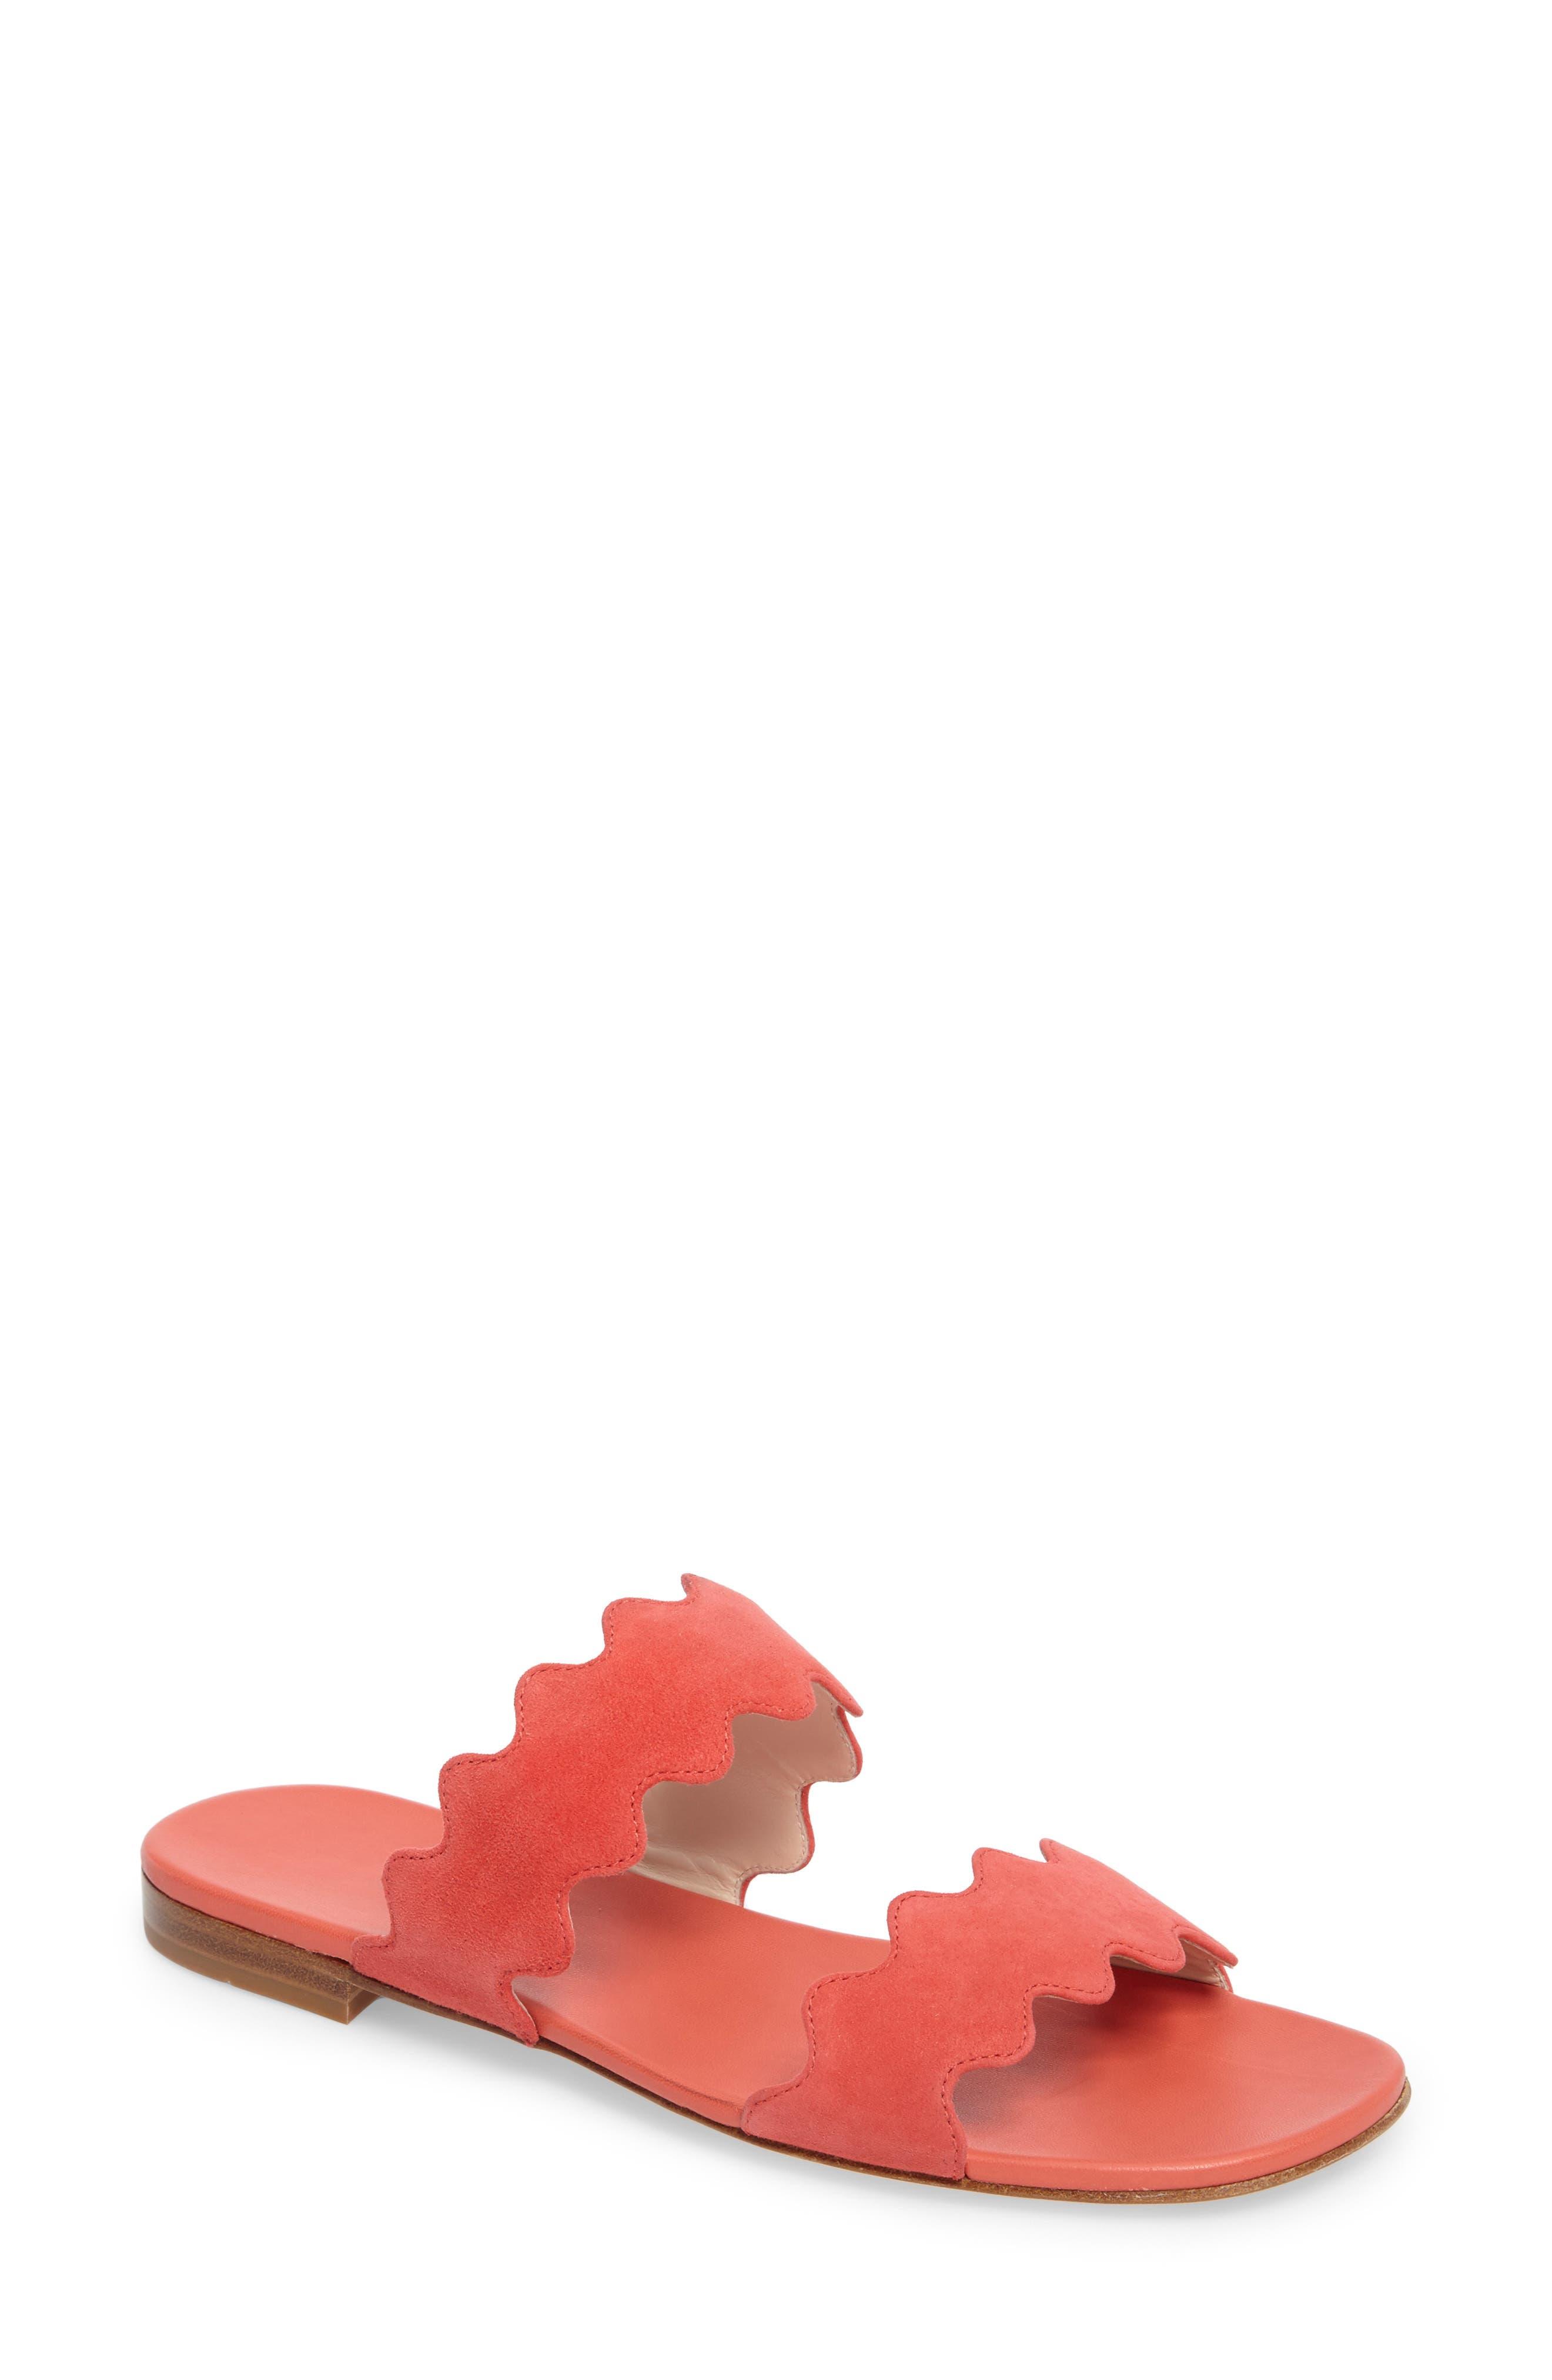 Double Strap Wave Sandal,                         Main,                         color, Corallo